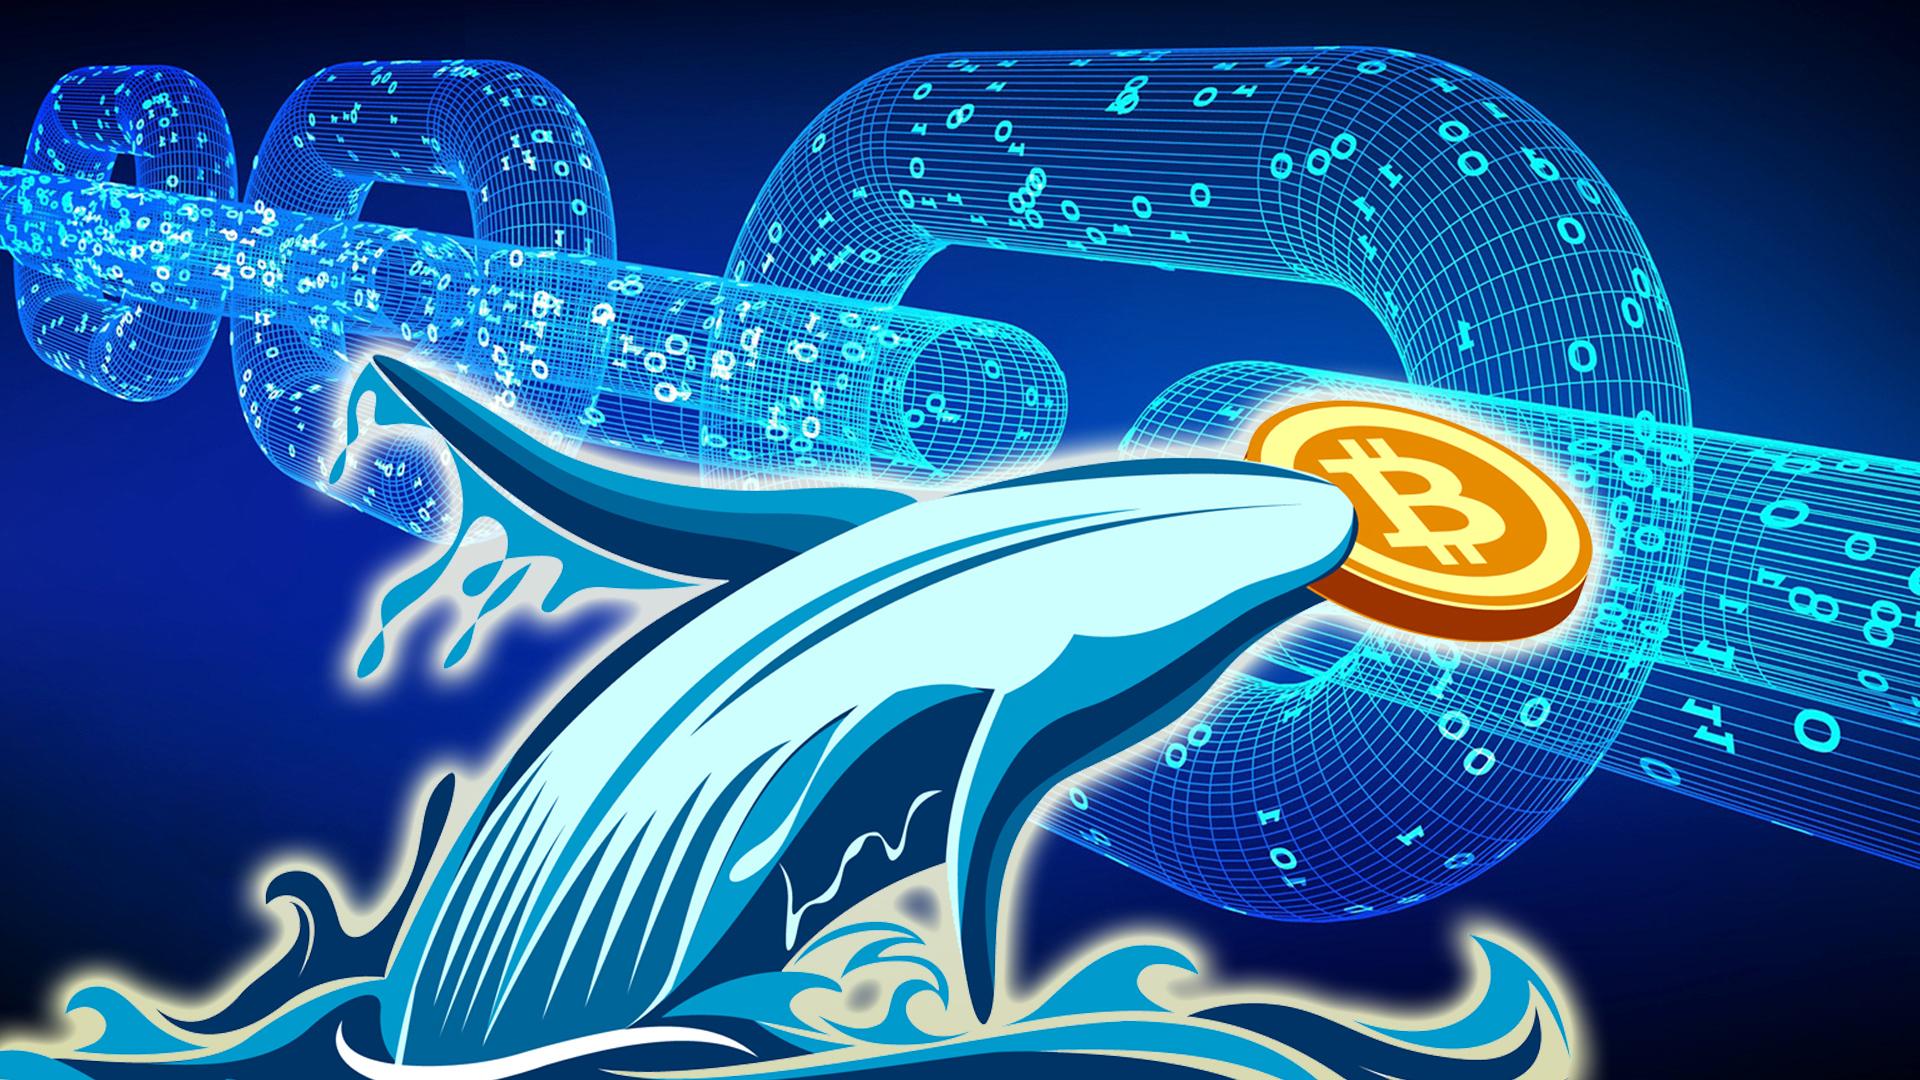 bitcoin btc balinaları harekete geçti